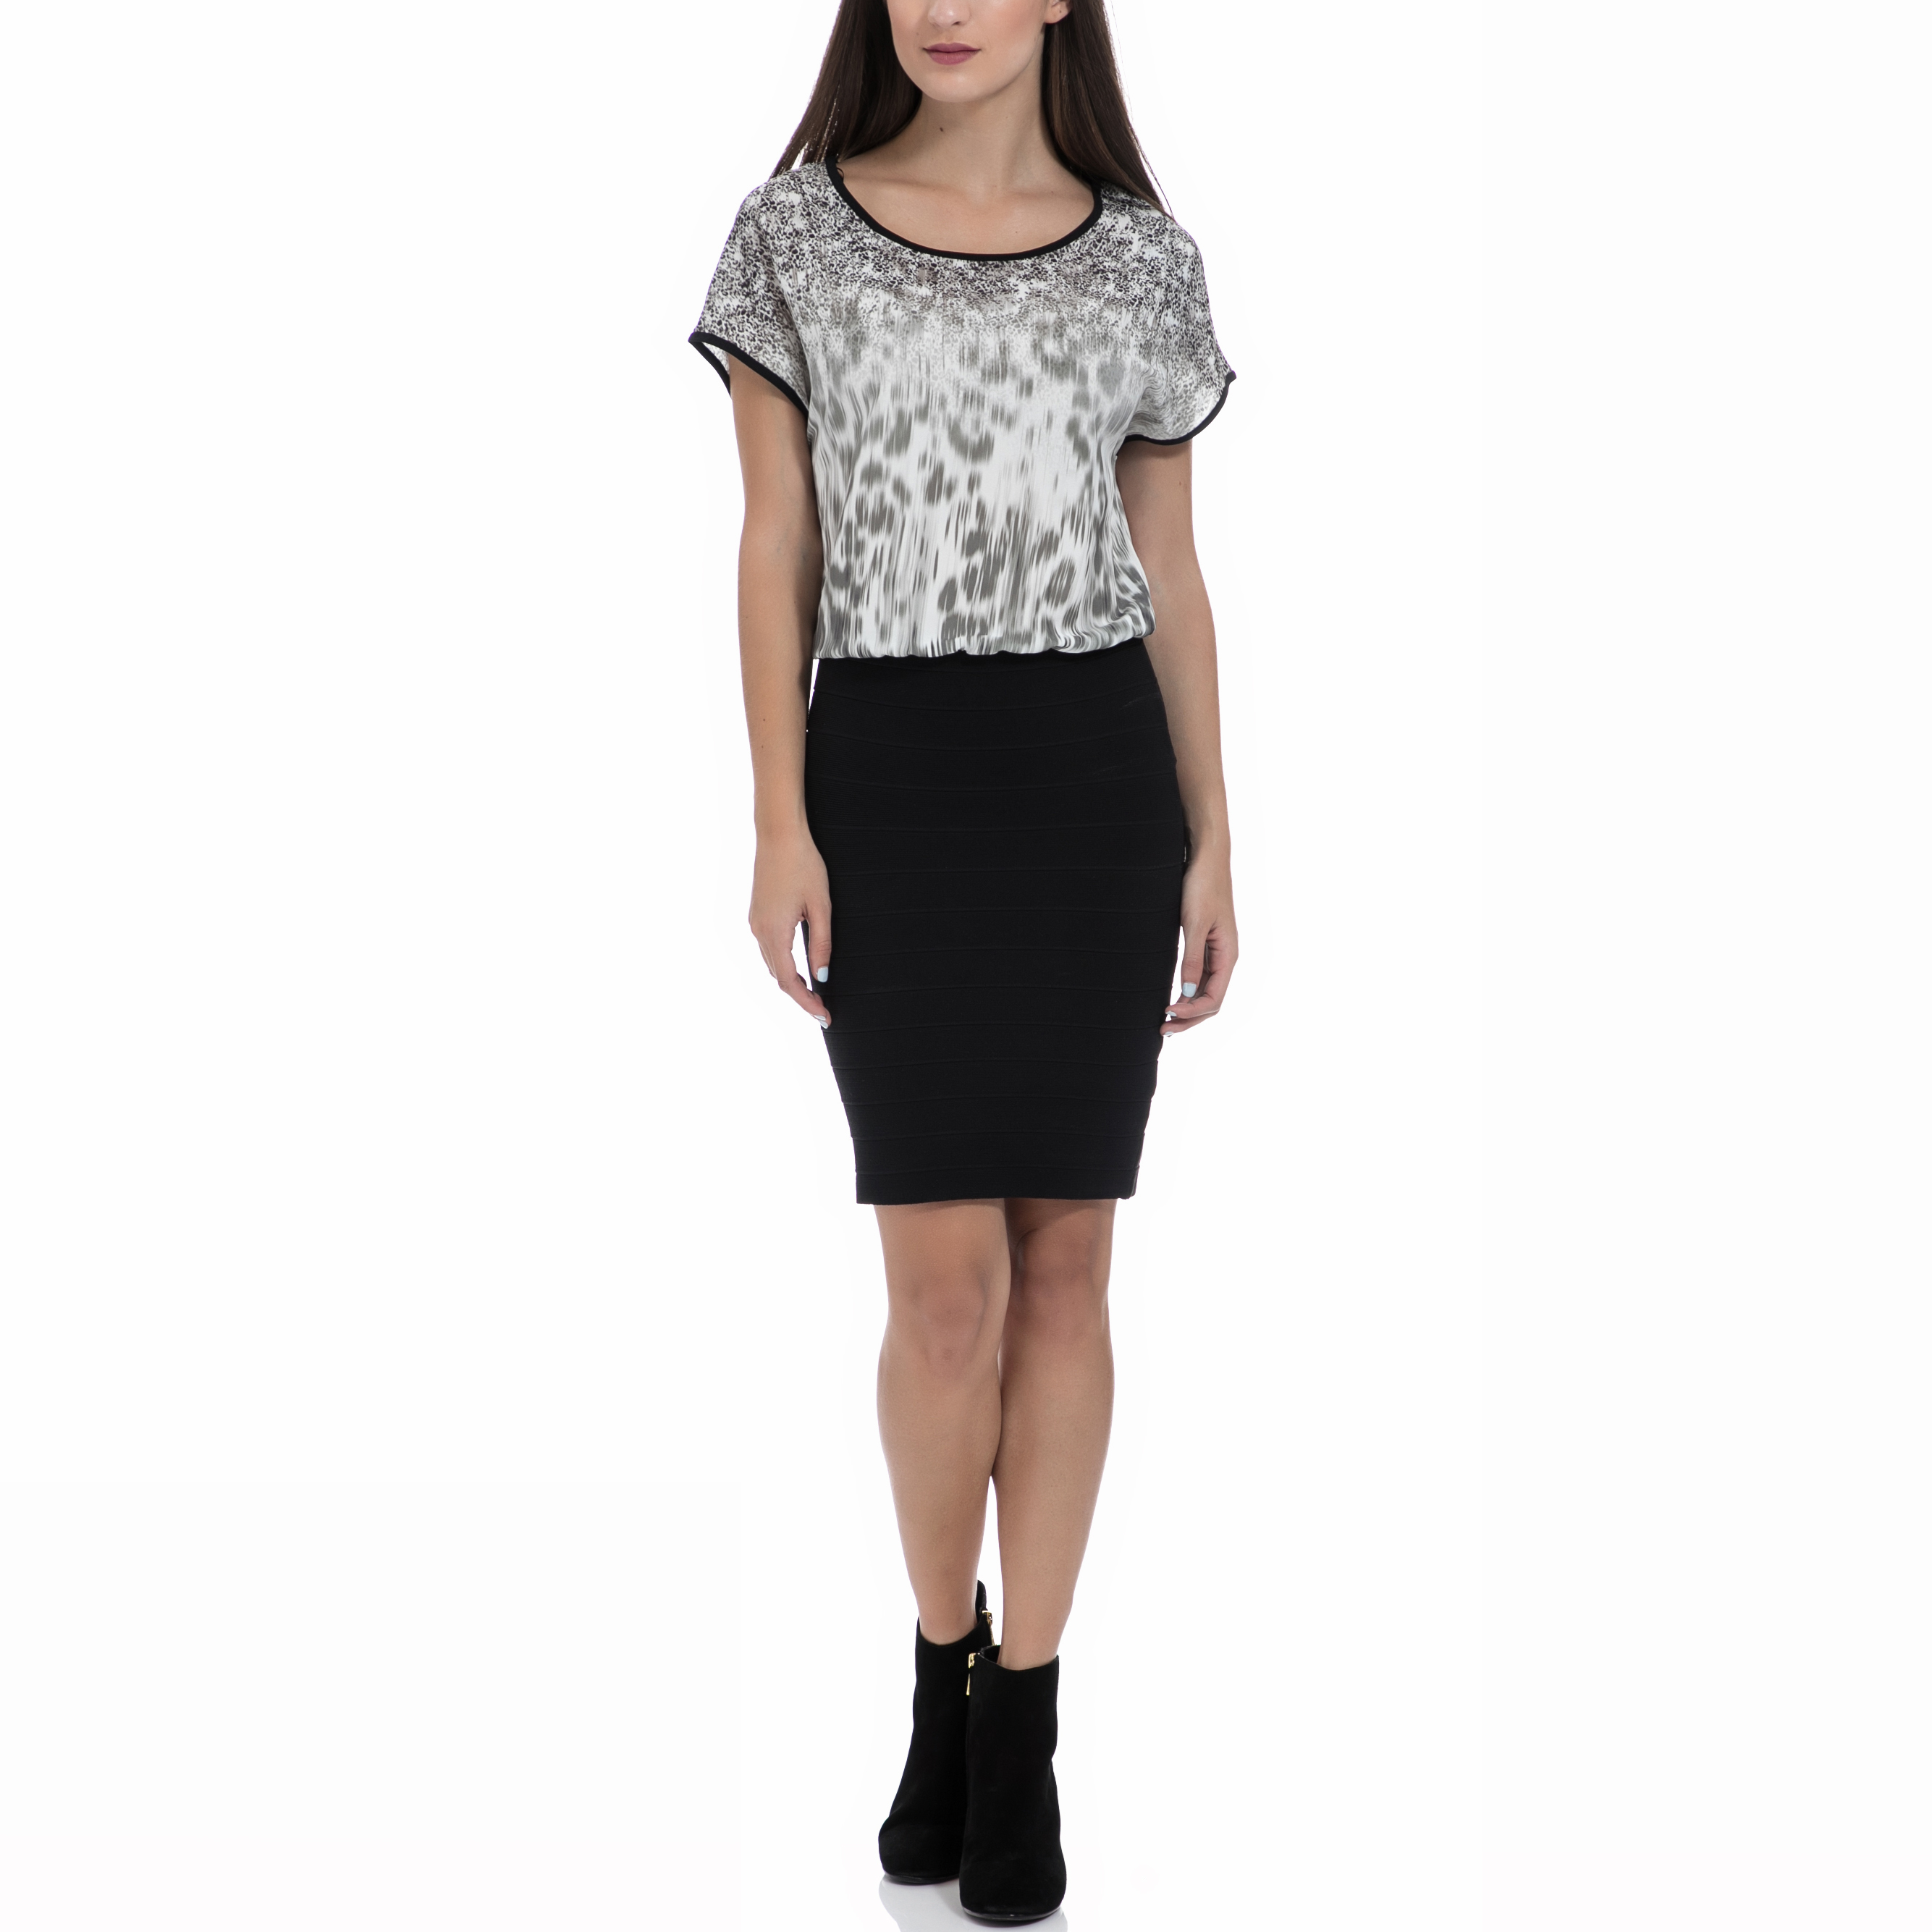 GUESS - Γυναικείο φόρεμα GUESS μαύρο γυναικεία ρούχα φορέματα μέχρι το γόνατο